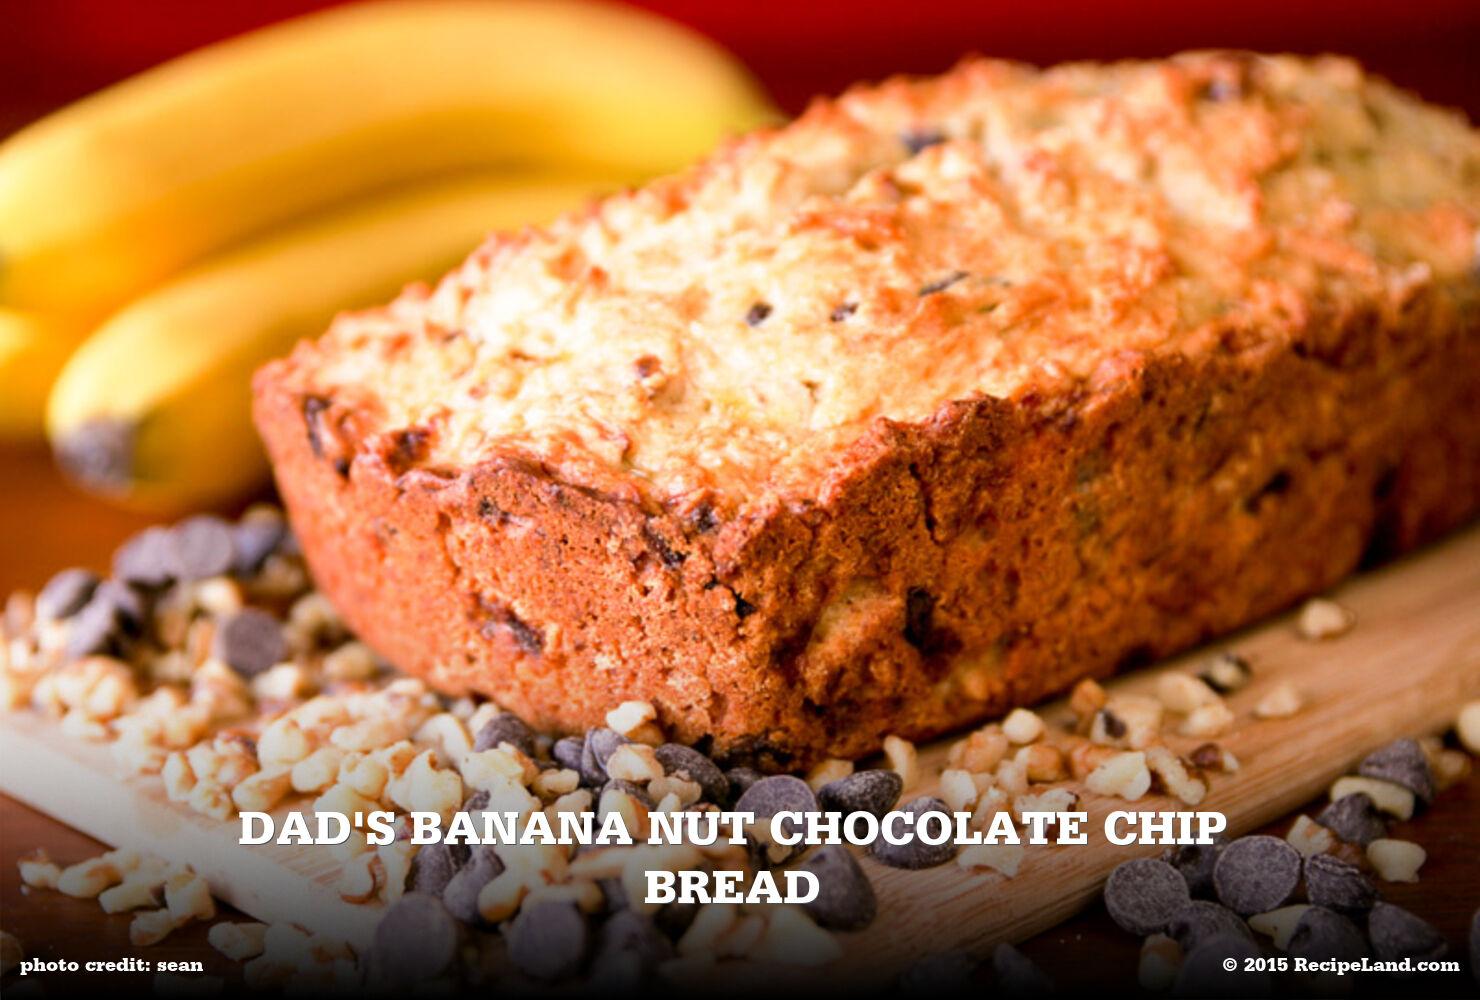 Dad's Banana Nut Chocolate Chip Bread